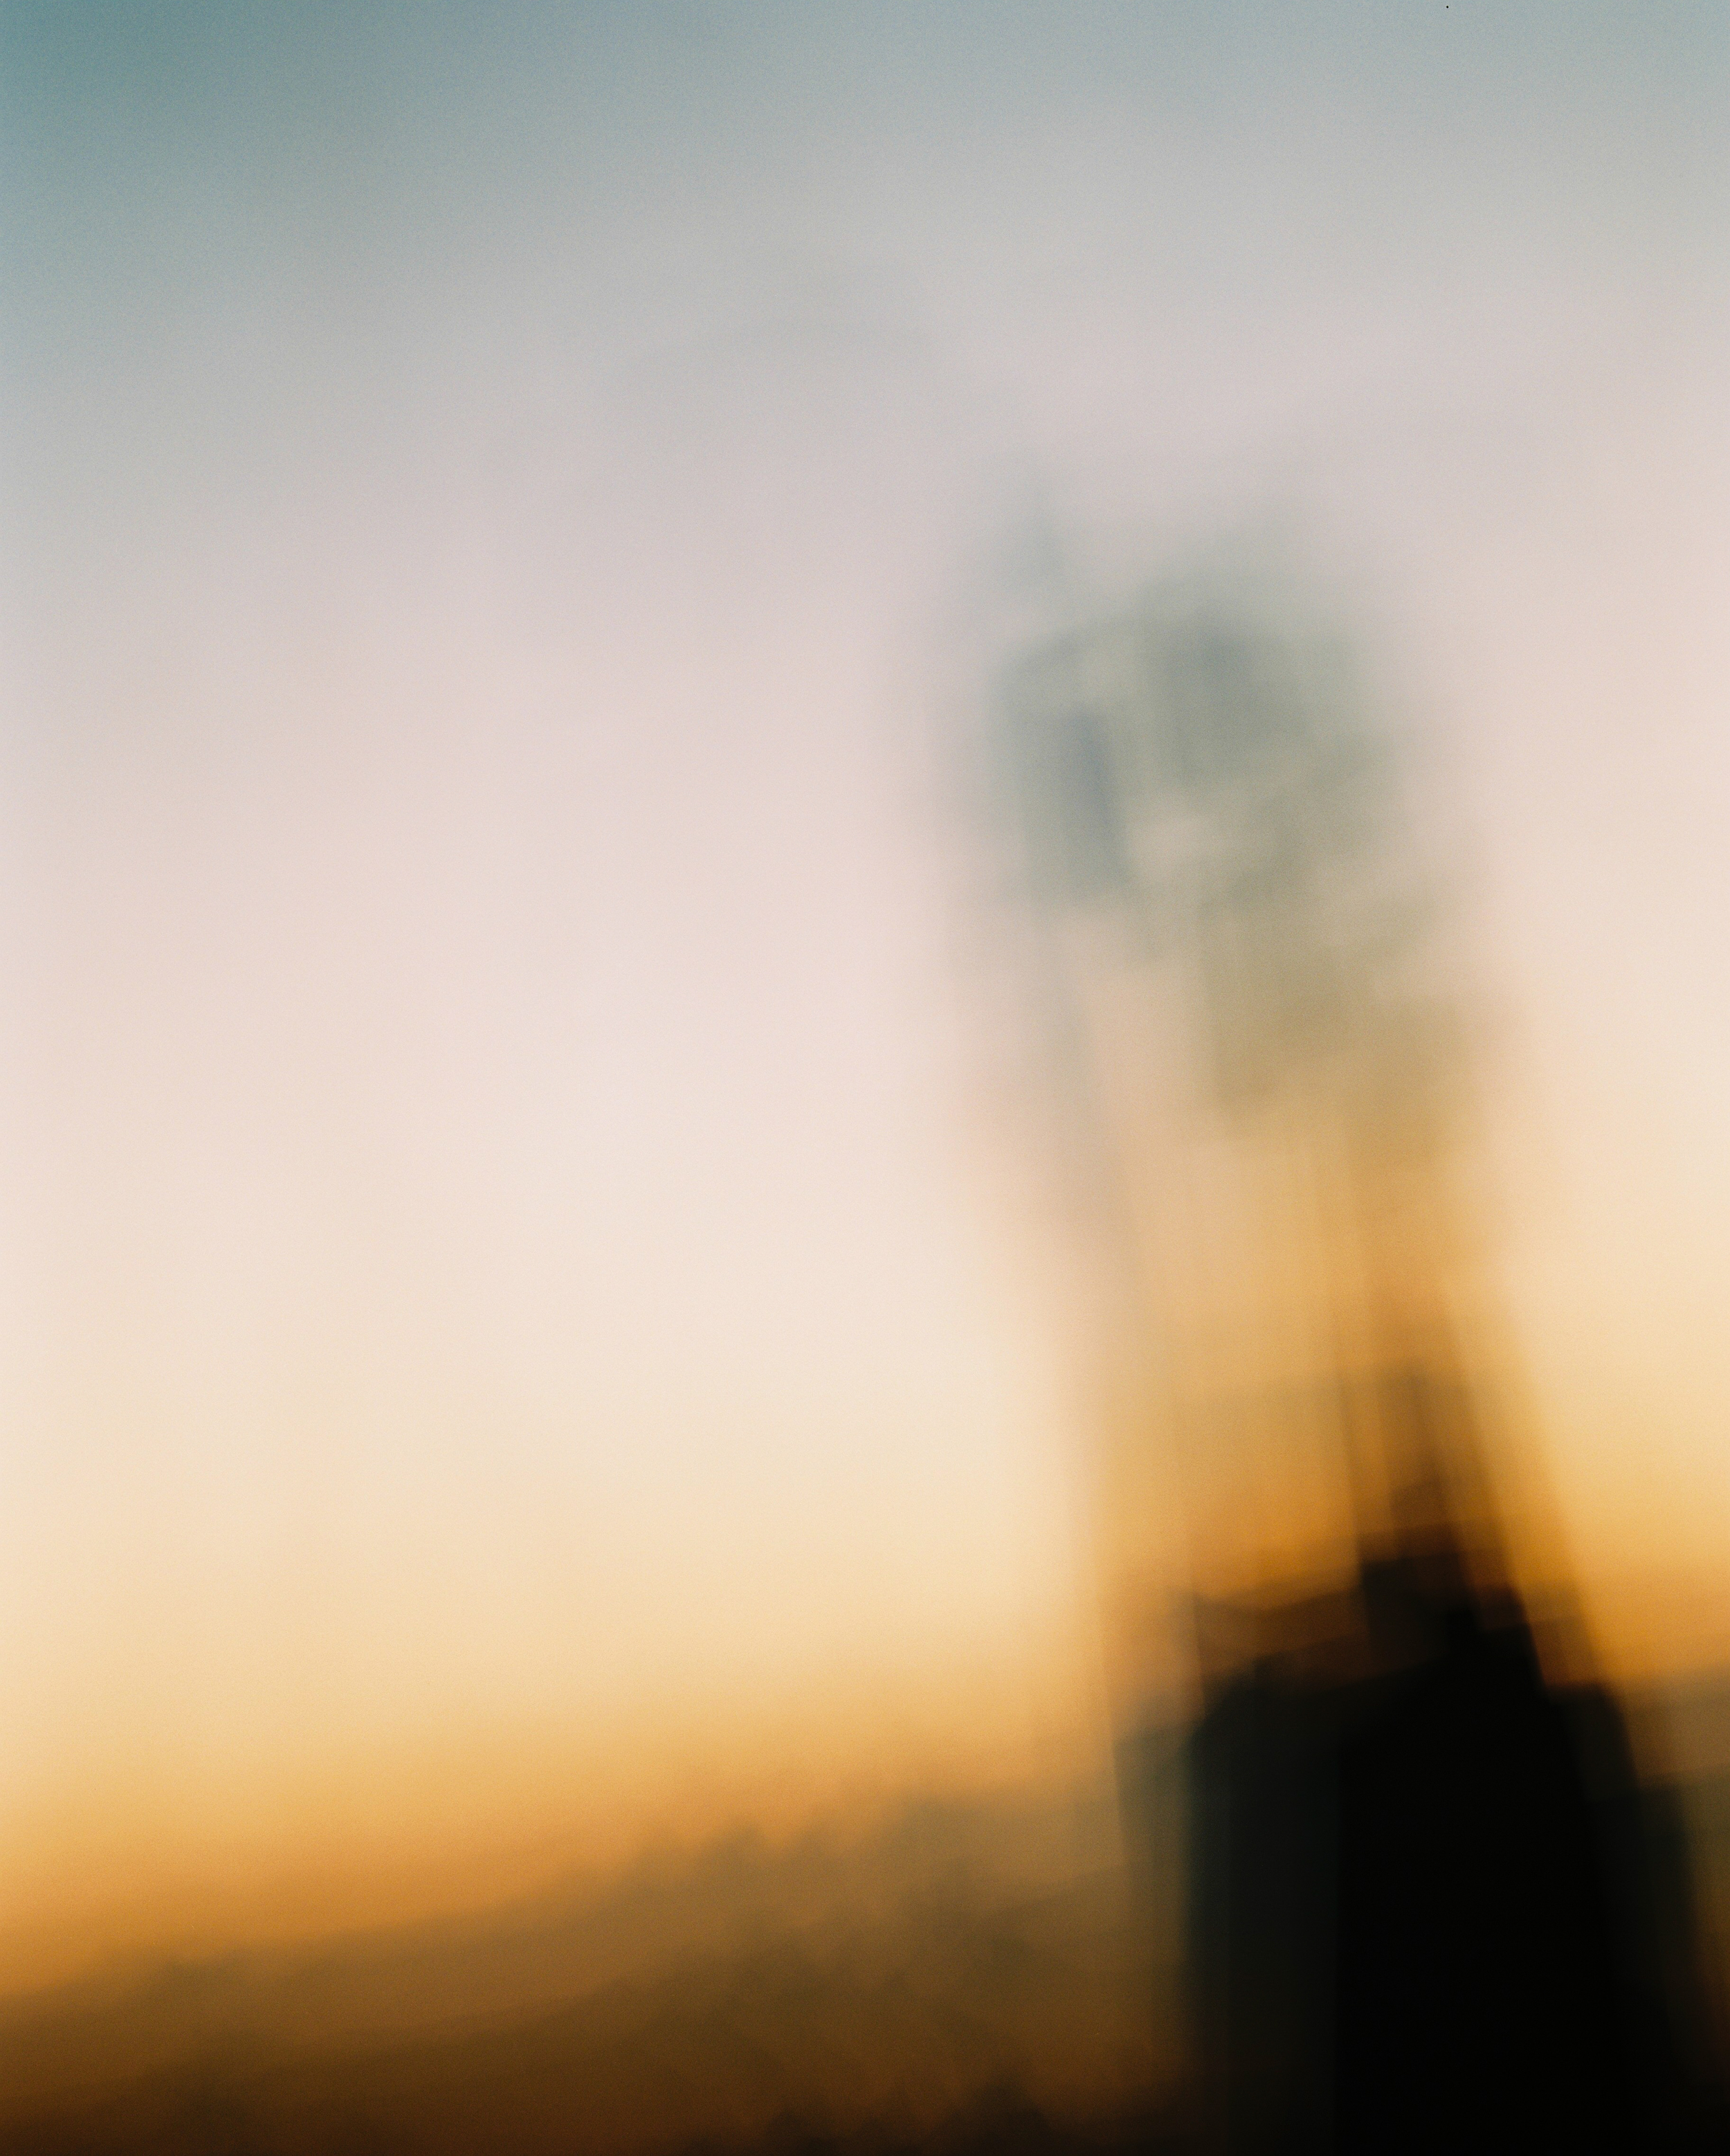 Eve of the apocalypse | Cross de Pen Hir | RB67, 90mm | Portra 160 | Nils Karlson